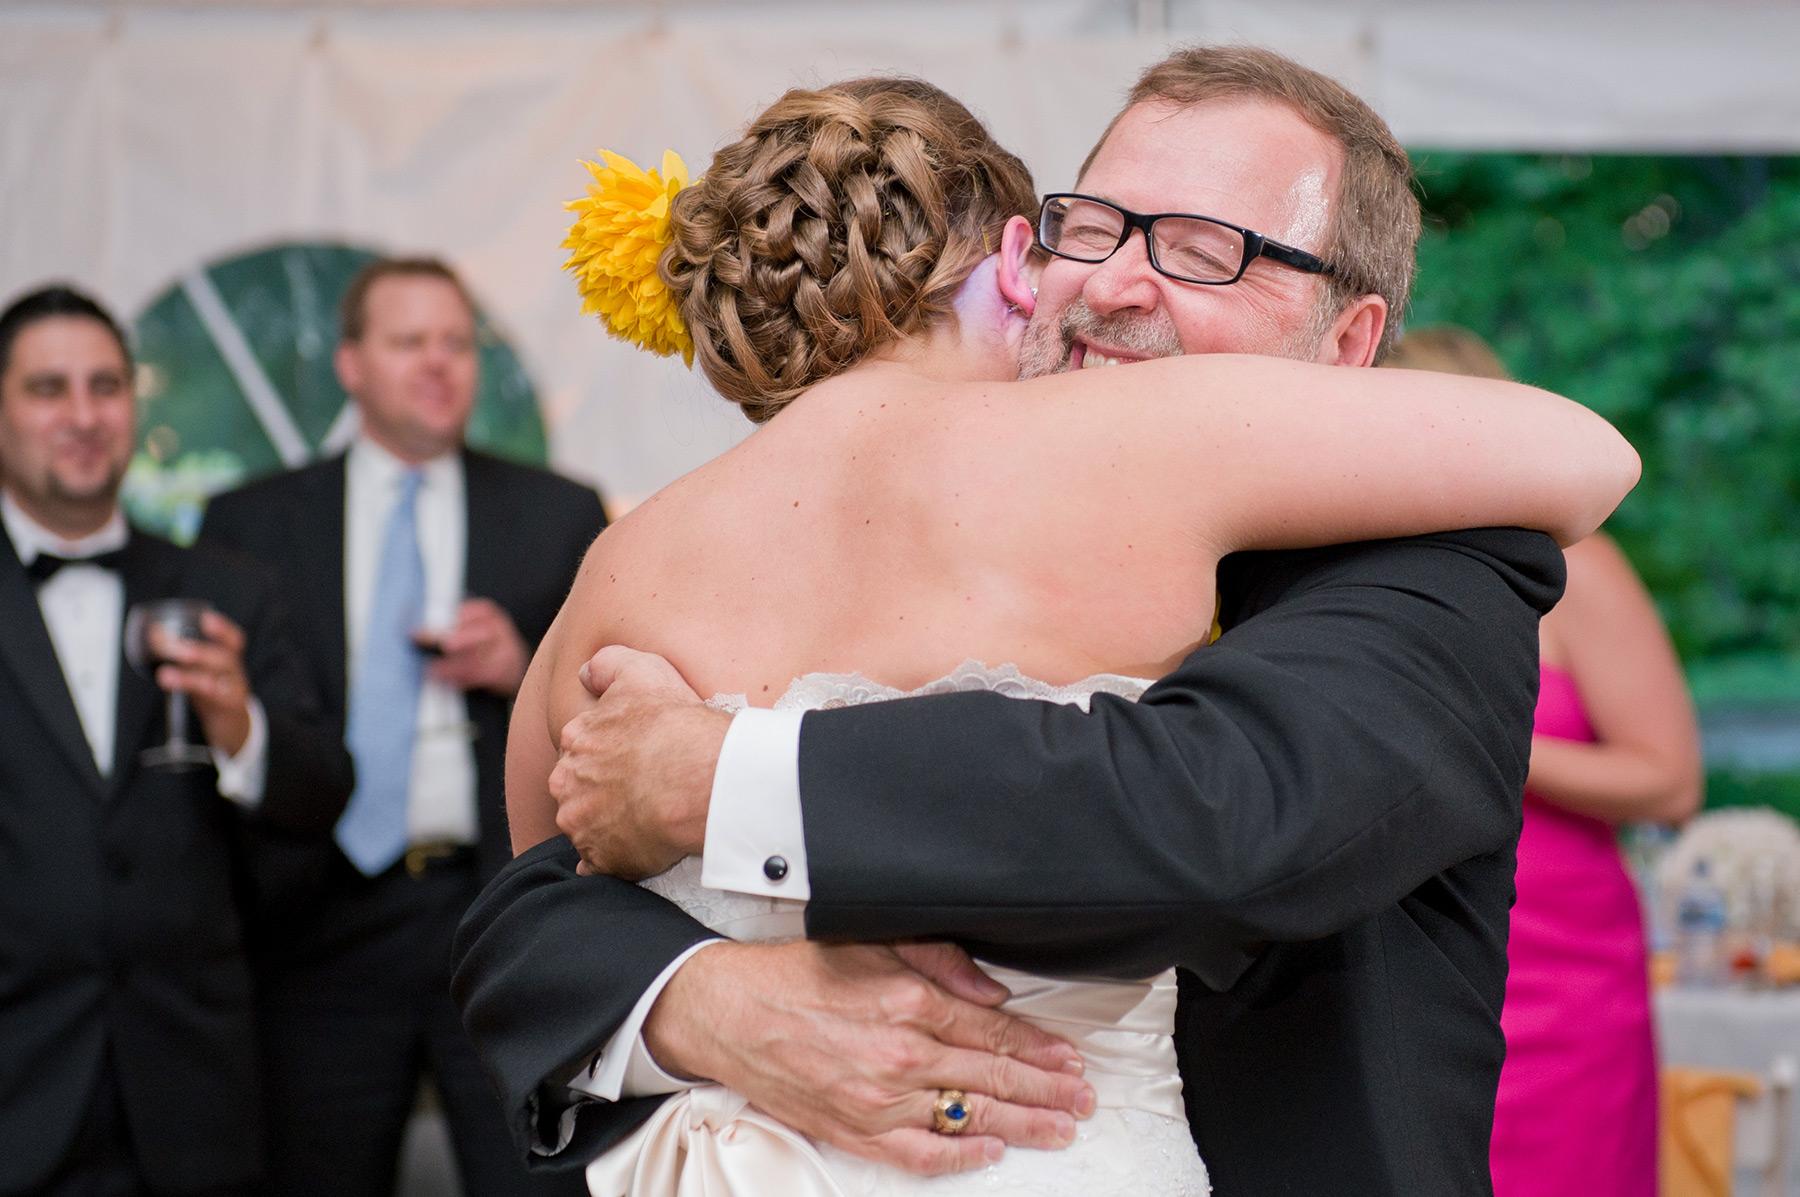 wedding-photography-saint-paul-mark-kegans-610.jpg